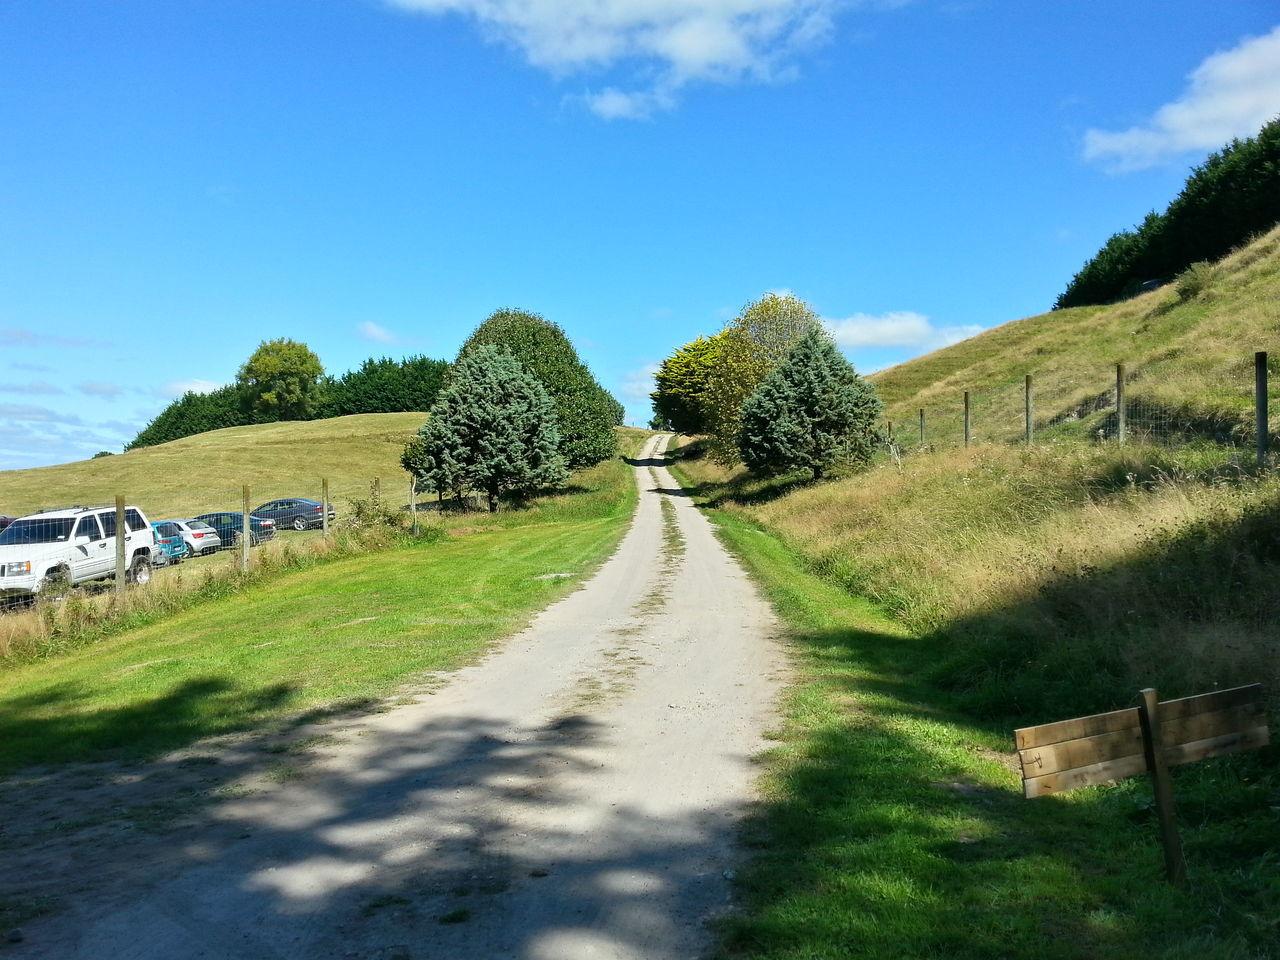 Country road wedding. Country Road Wedding Autumn New Zealand Scenery